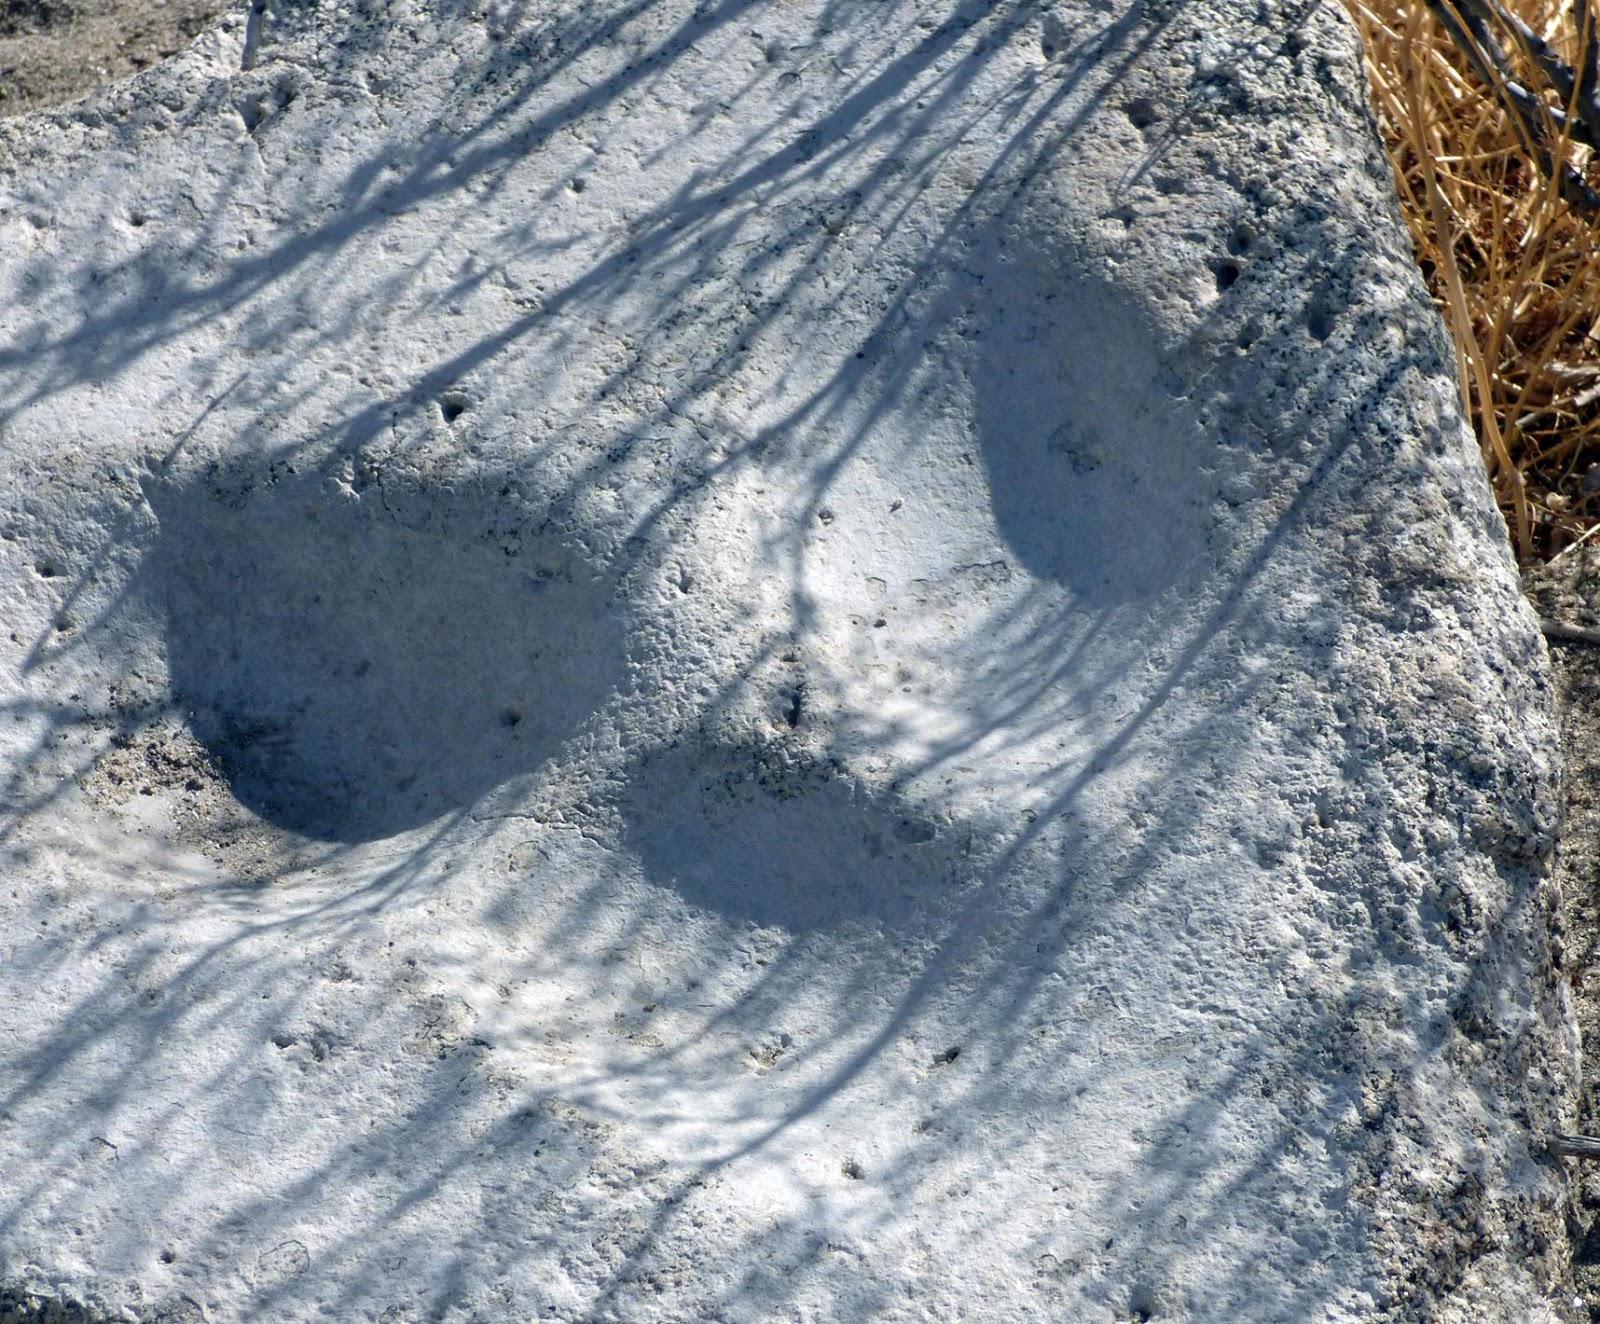 ARMCHAIR HIKER SAN DIEGO & MORE: Mine Wash Trail Anza Borrego Desert ...